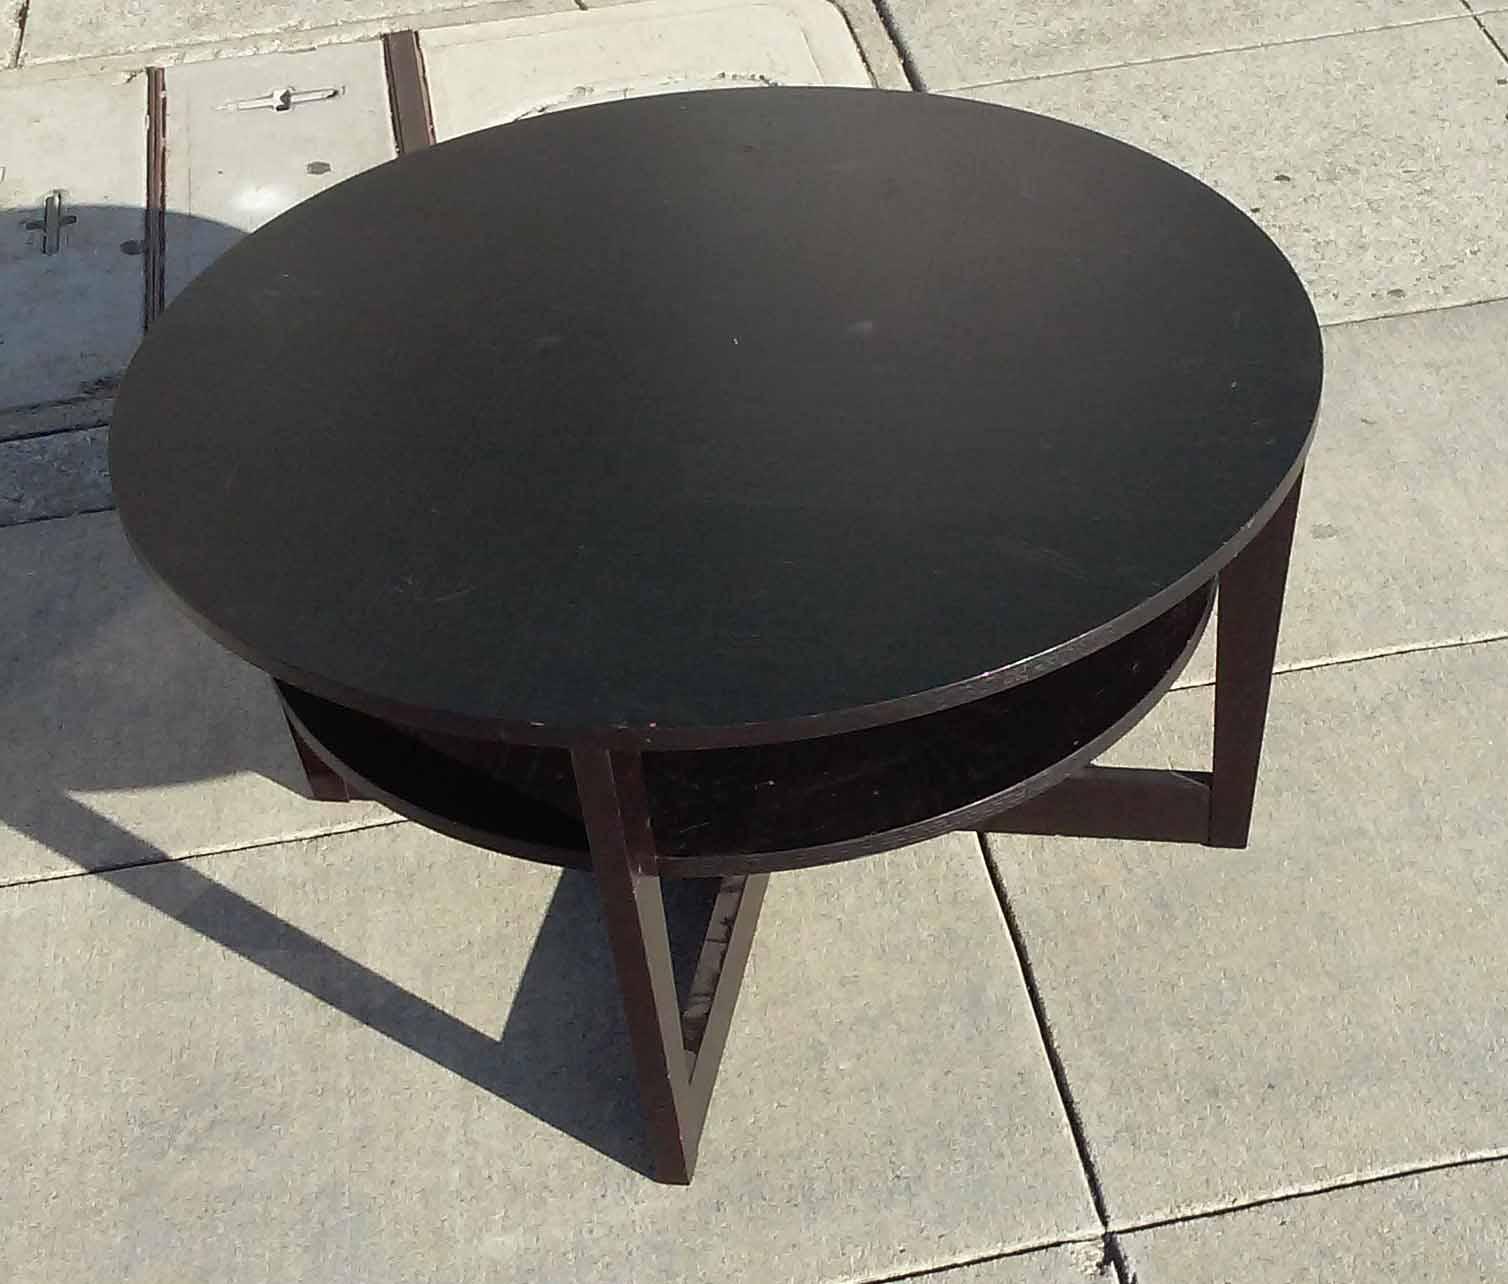 UHURU FURNITURE & COLLECTIBLES: SOLD Ikea Black Round